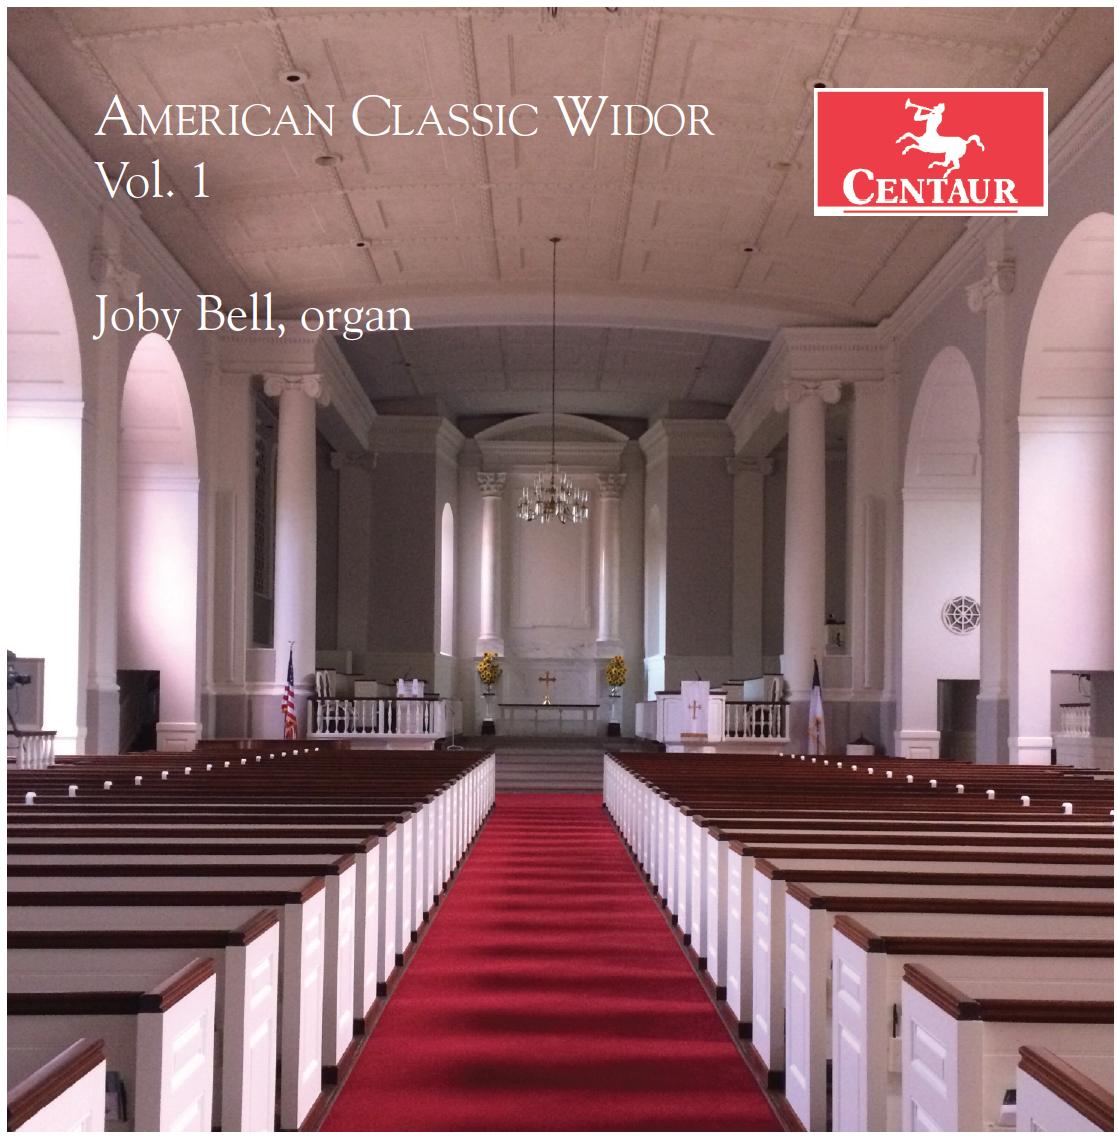 American Classic Widor, Volume 1, Joby Bell